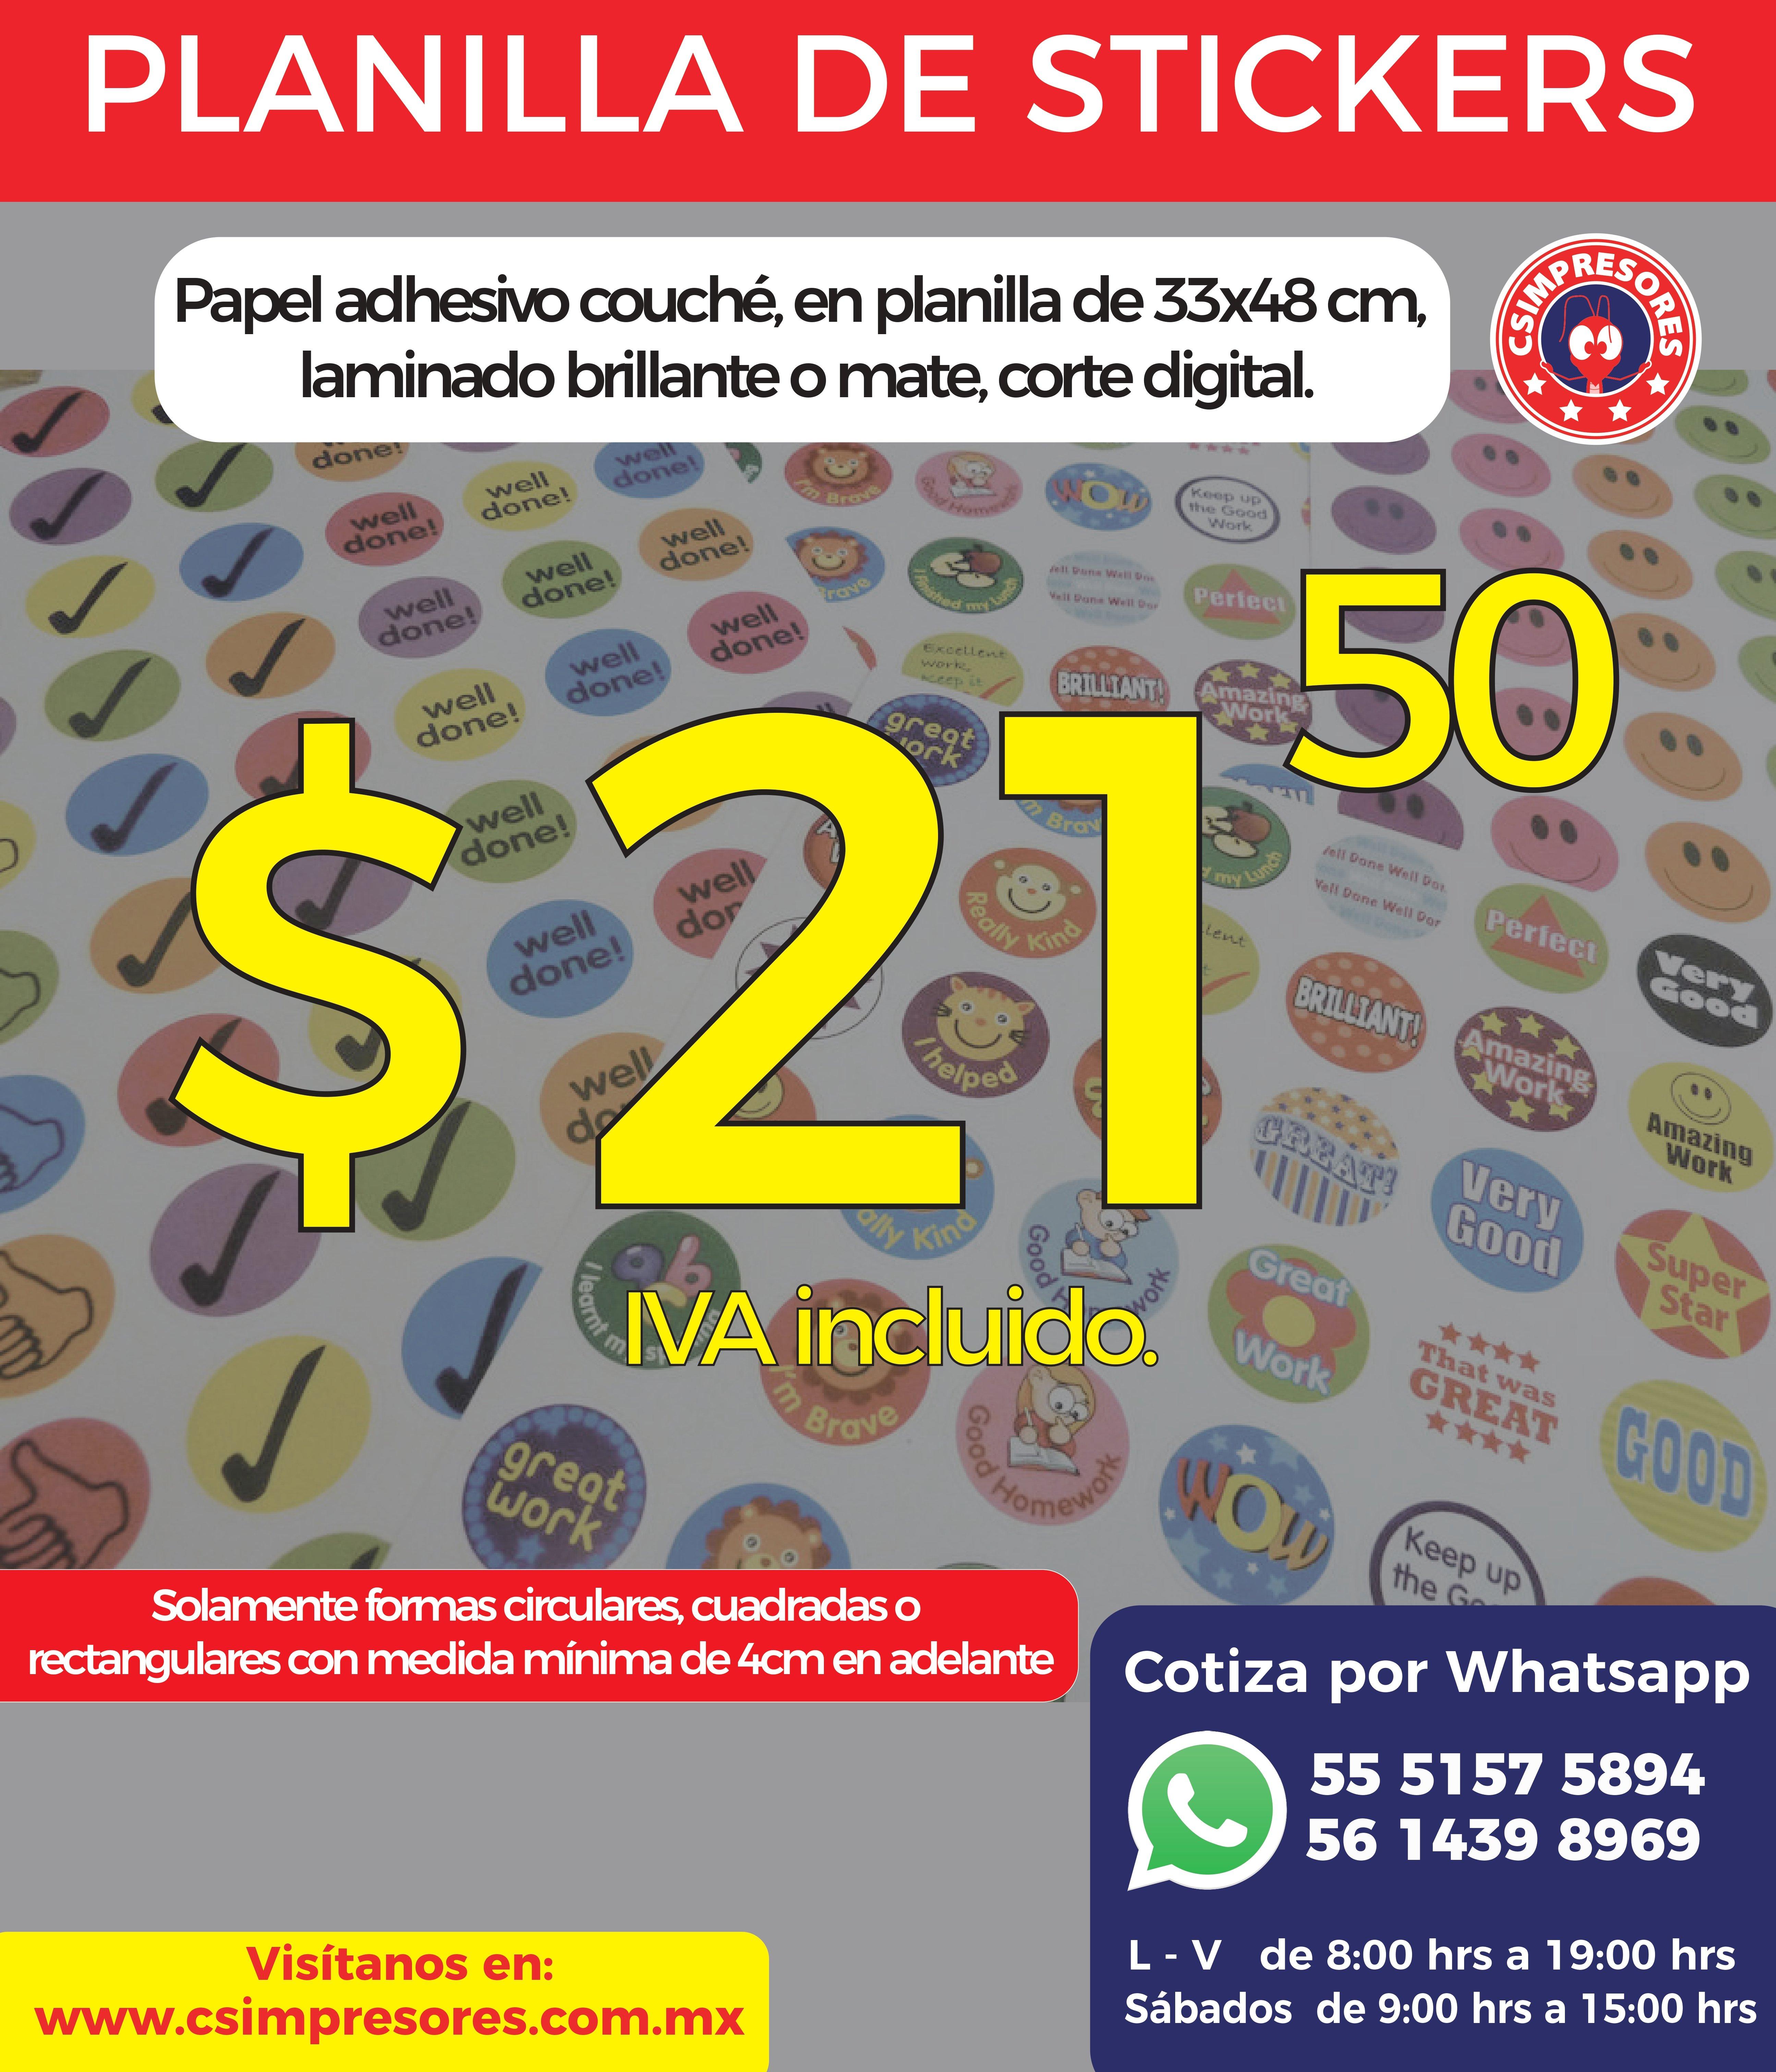 https://0201.nccdn.net/4_2/000/000/038/2d3/stickers-21-con-50-mes-de-febrero--recuperado-_page-0001.jpg